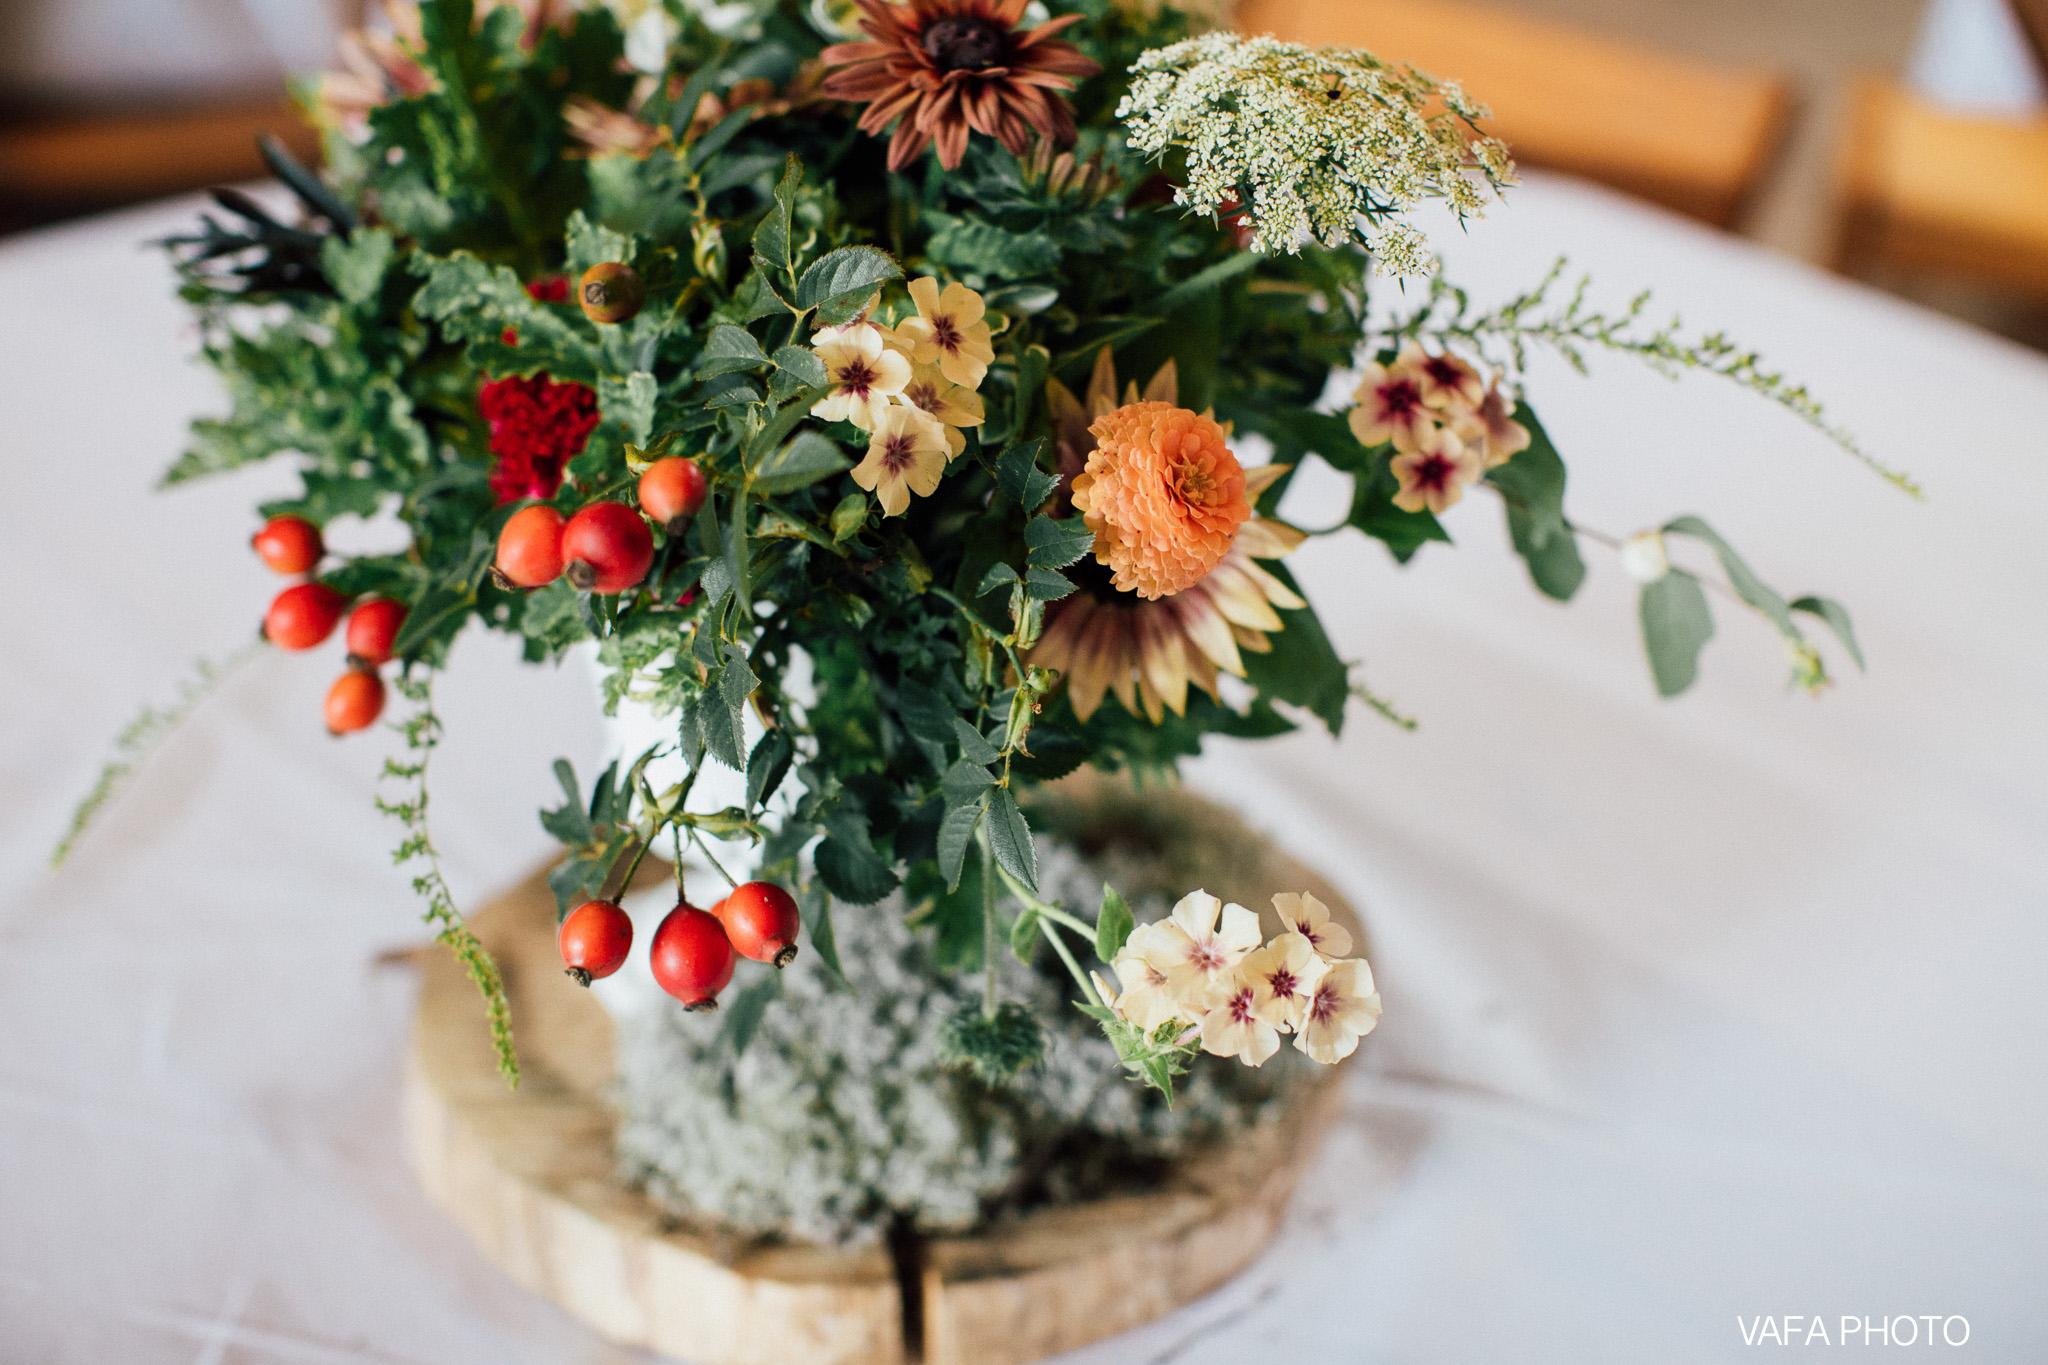 Belsolda-Farm-Wedding-Christy-Eric-Vafa-Photo-291.jpg